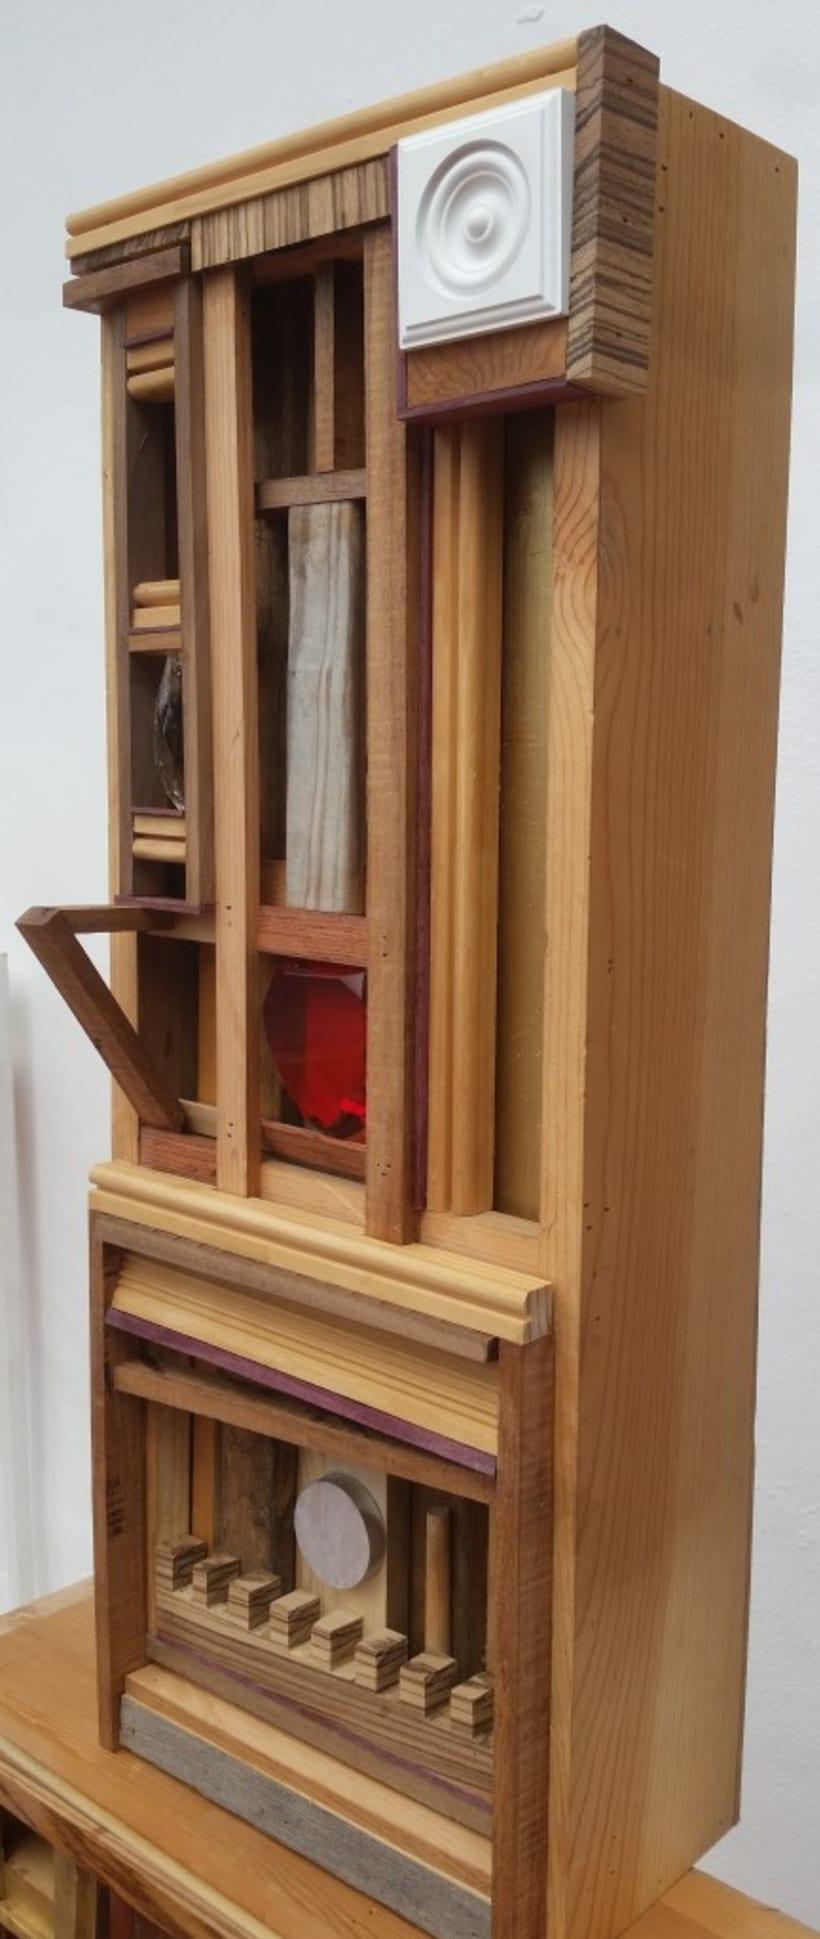 Dimensional Box 4